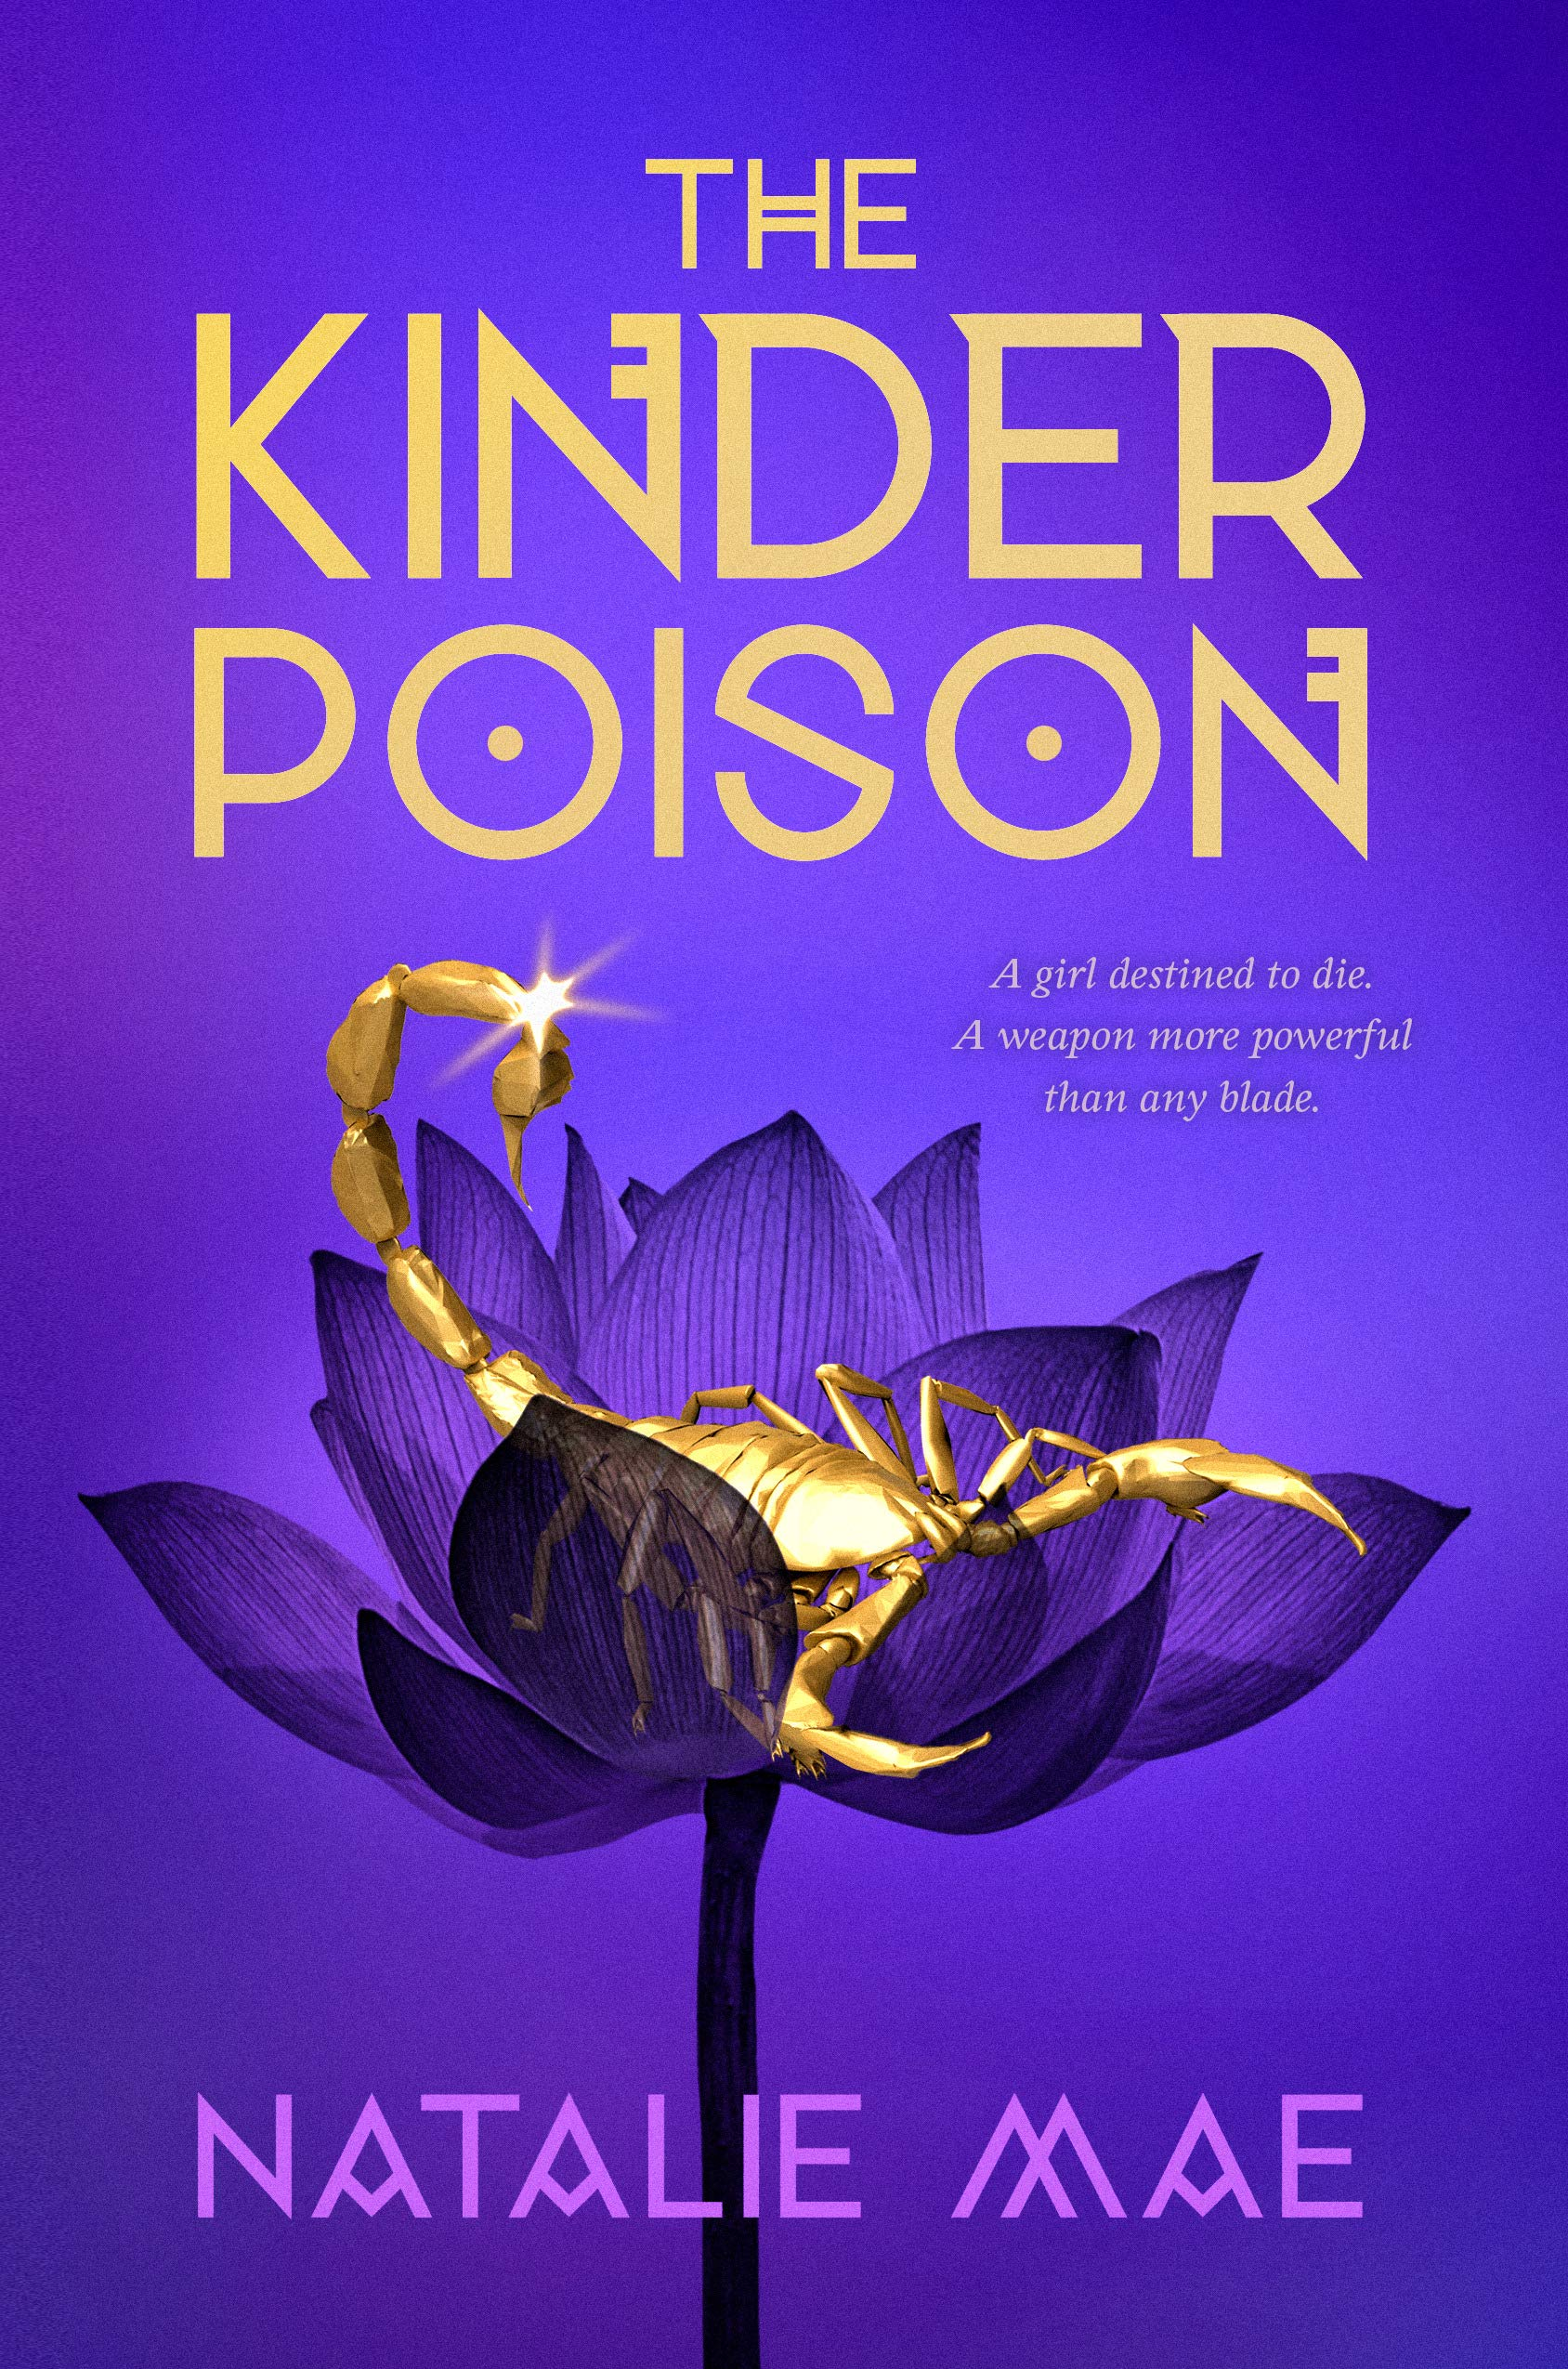 Amazon.com: The Kinder Poison (9781984835215): Mae, Natalie: Books